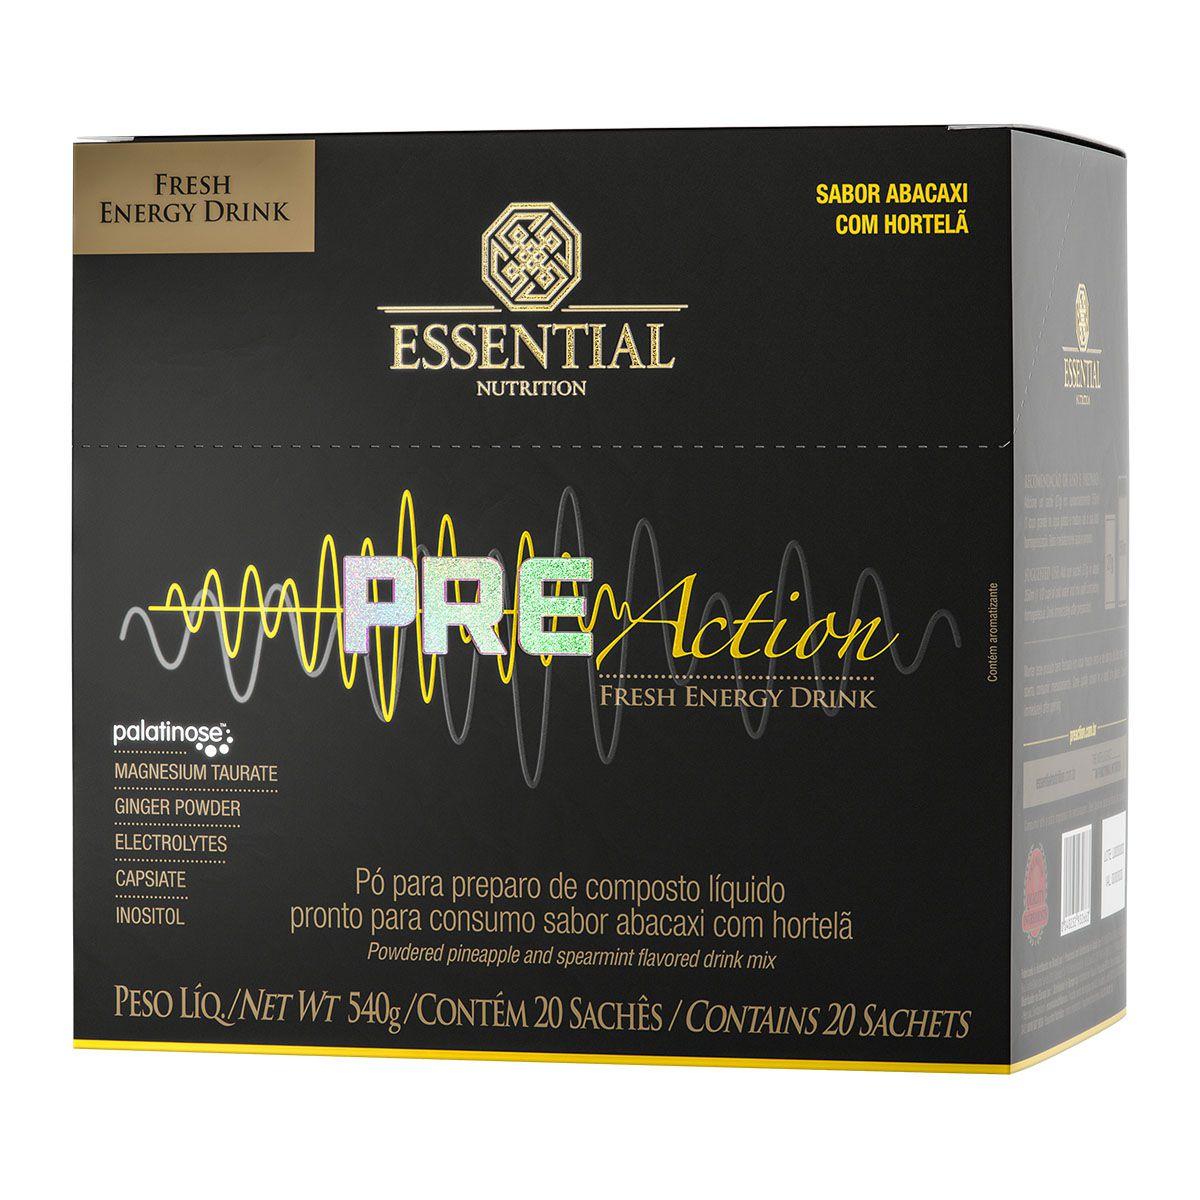 Pre Action 20 sachês/27g - Essential Nutrition